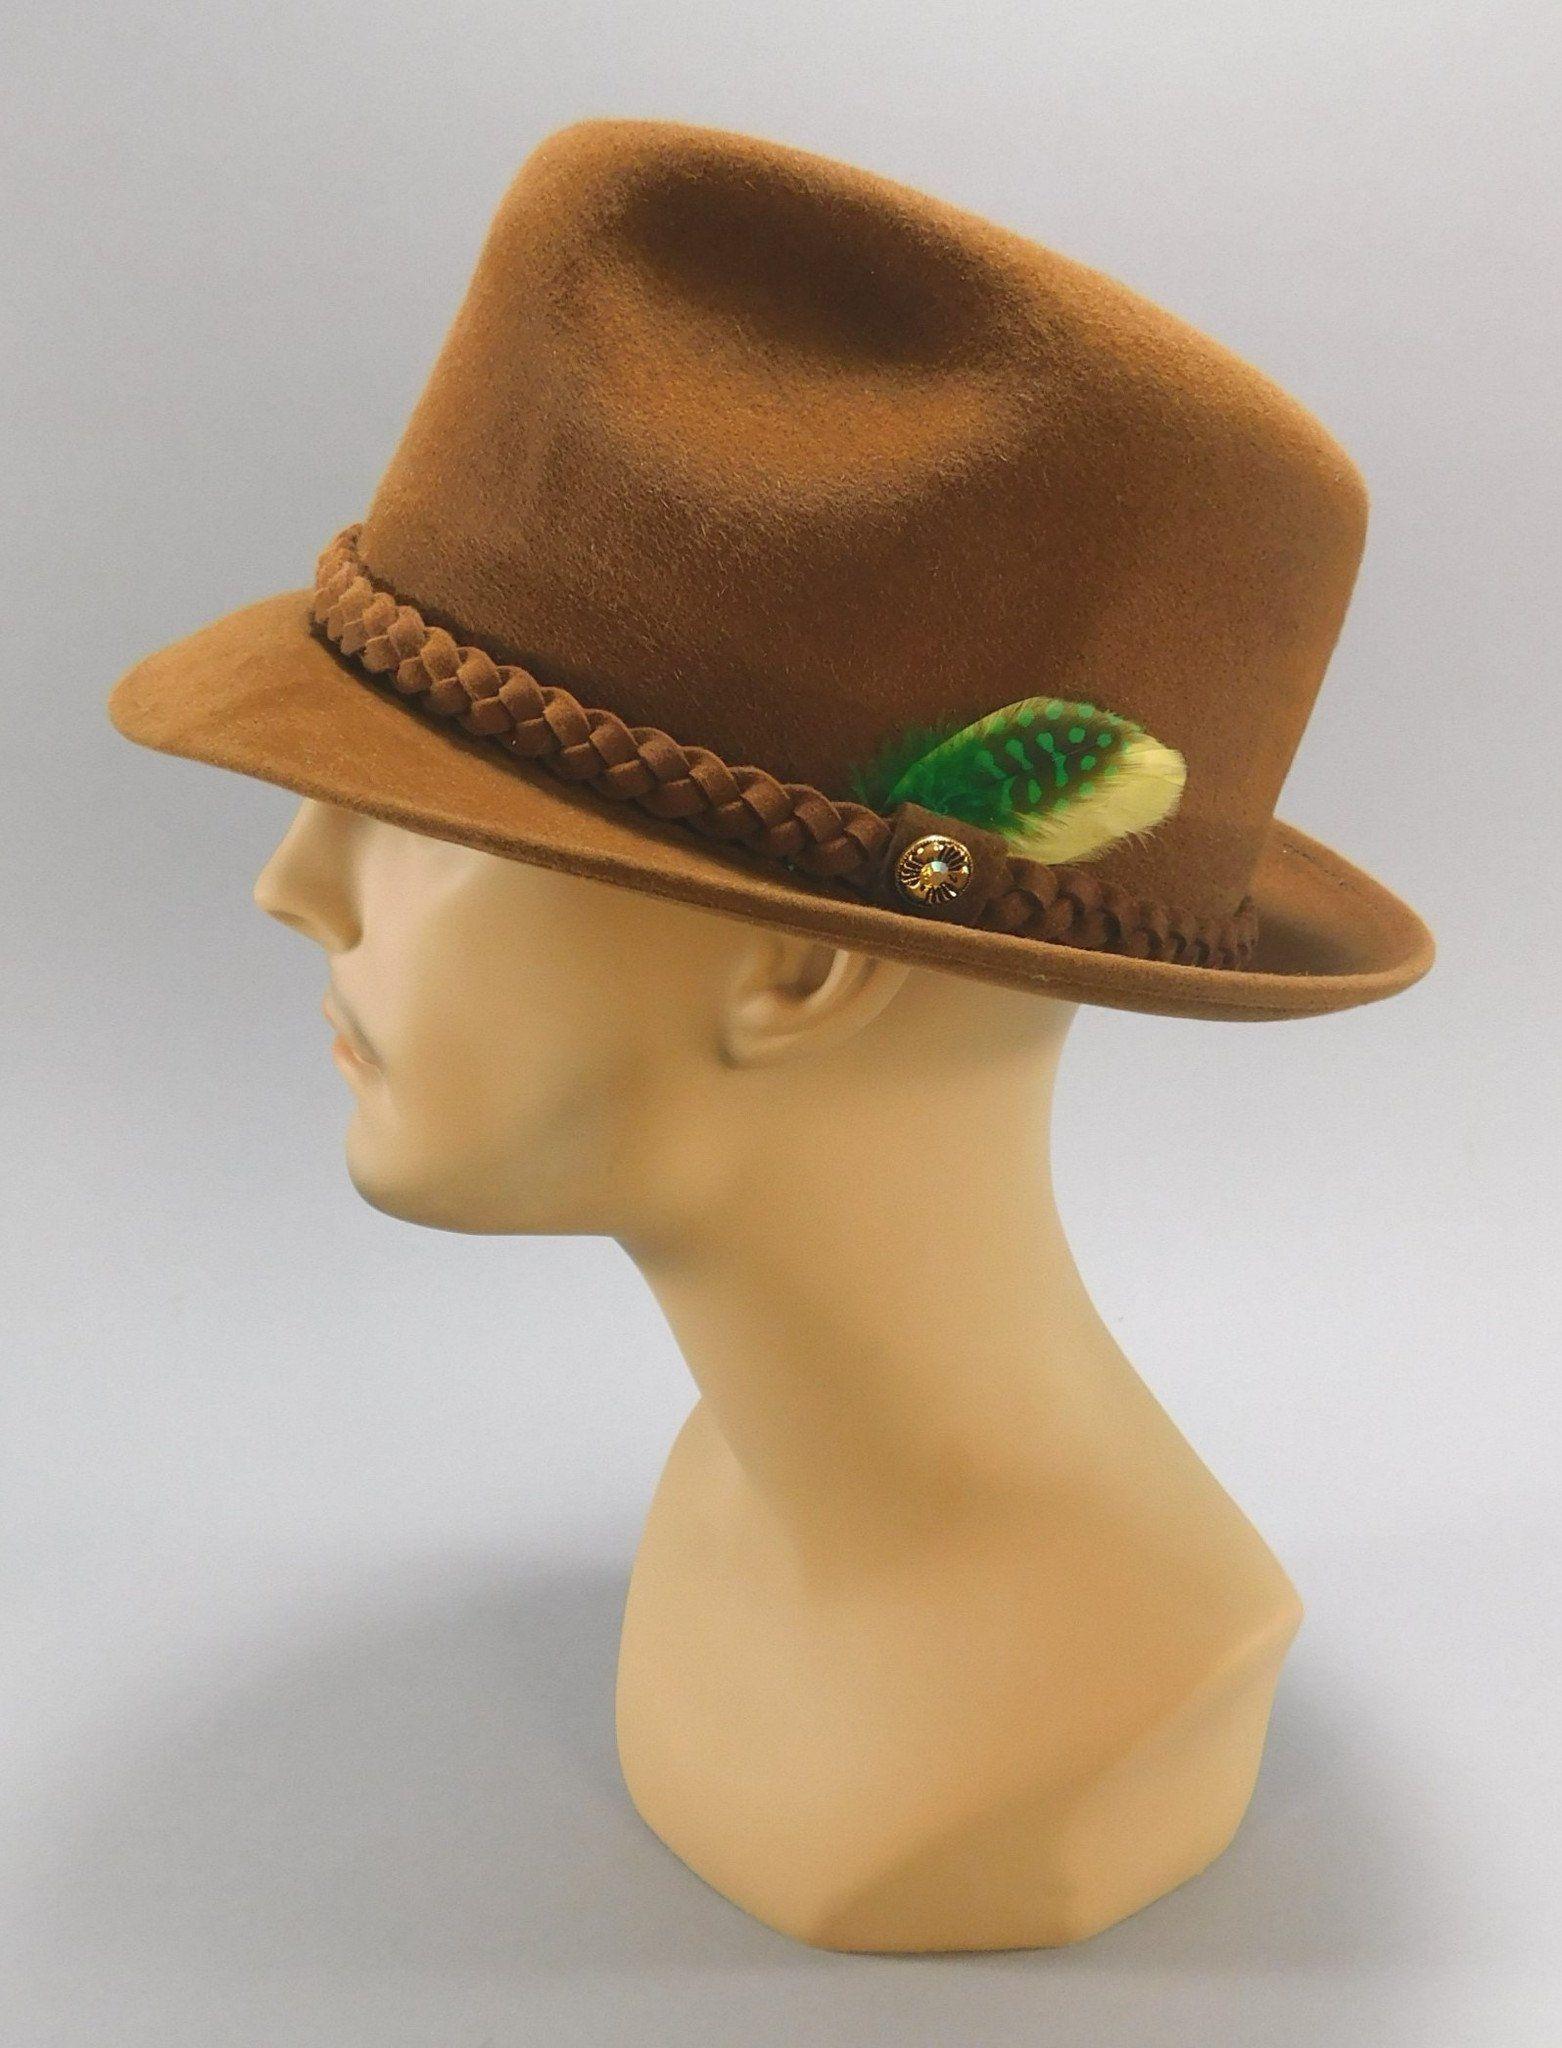 1950 s - 1960 s Vintage Brown Felt Fedora   Trilby Hat by Lion Hats ... 7ee98474ebd3